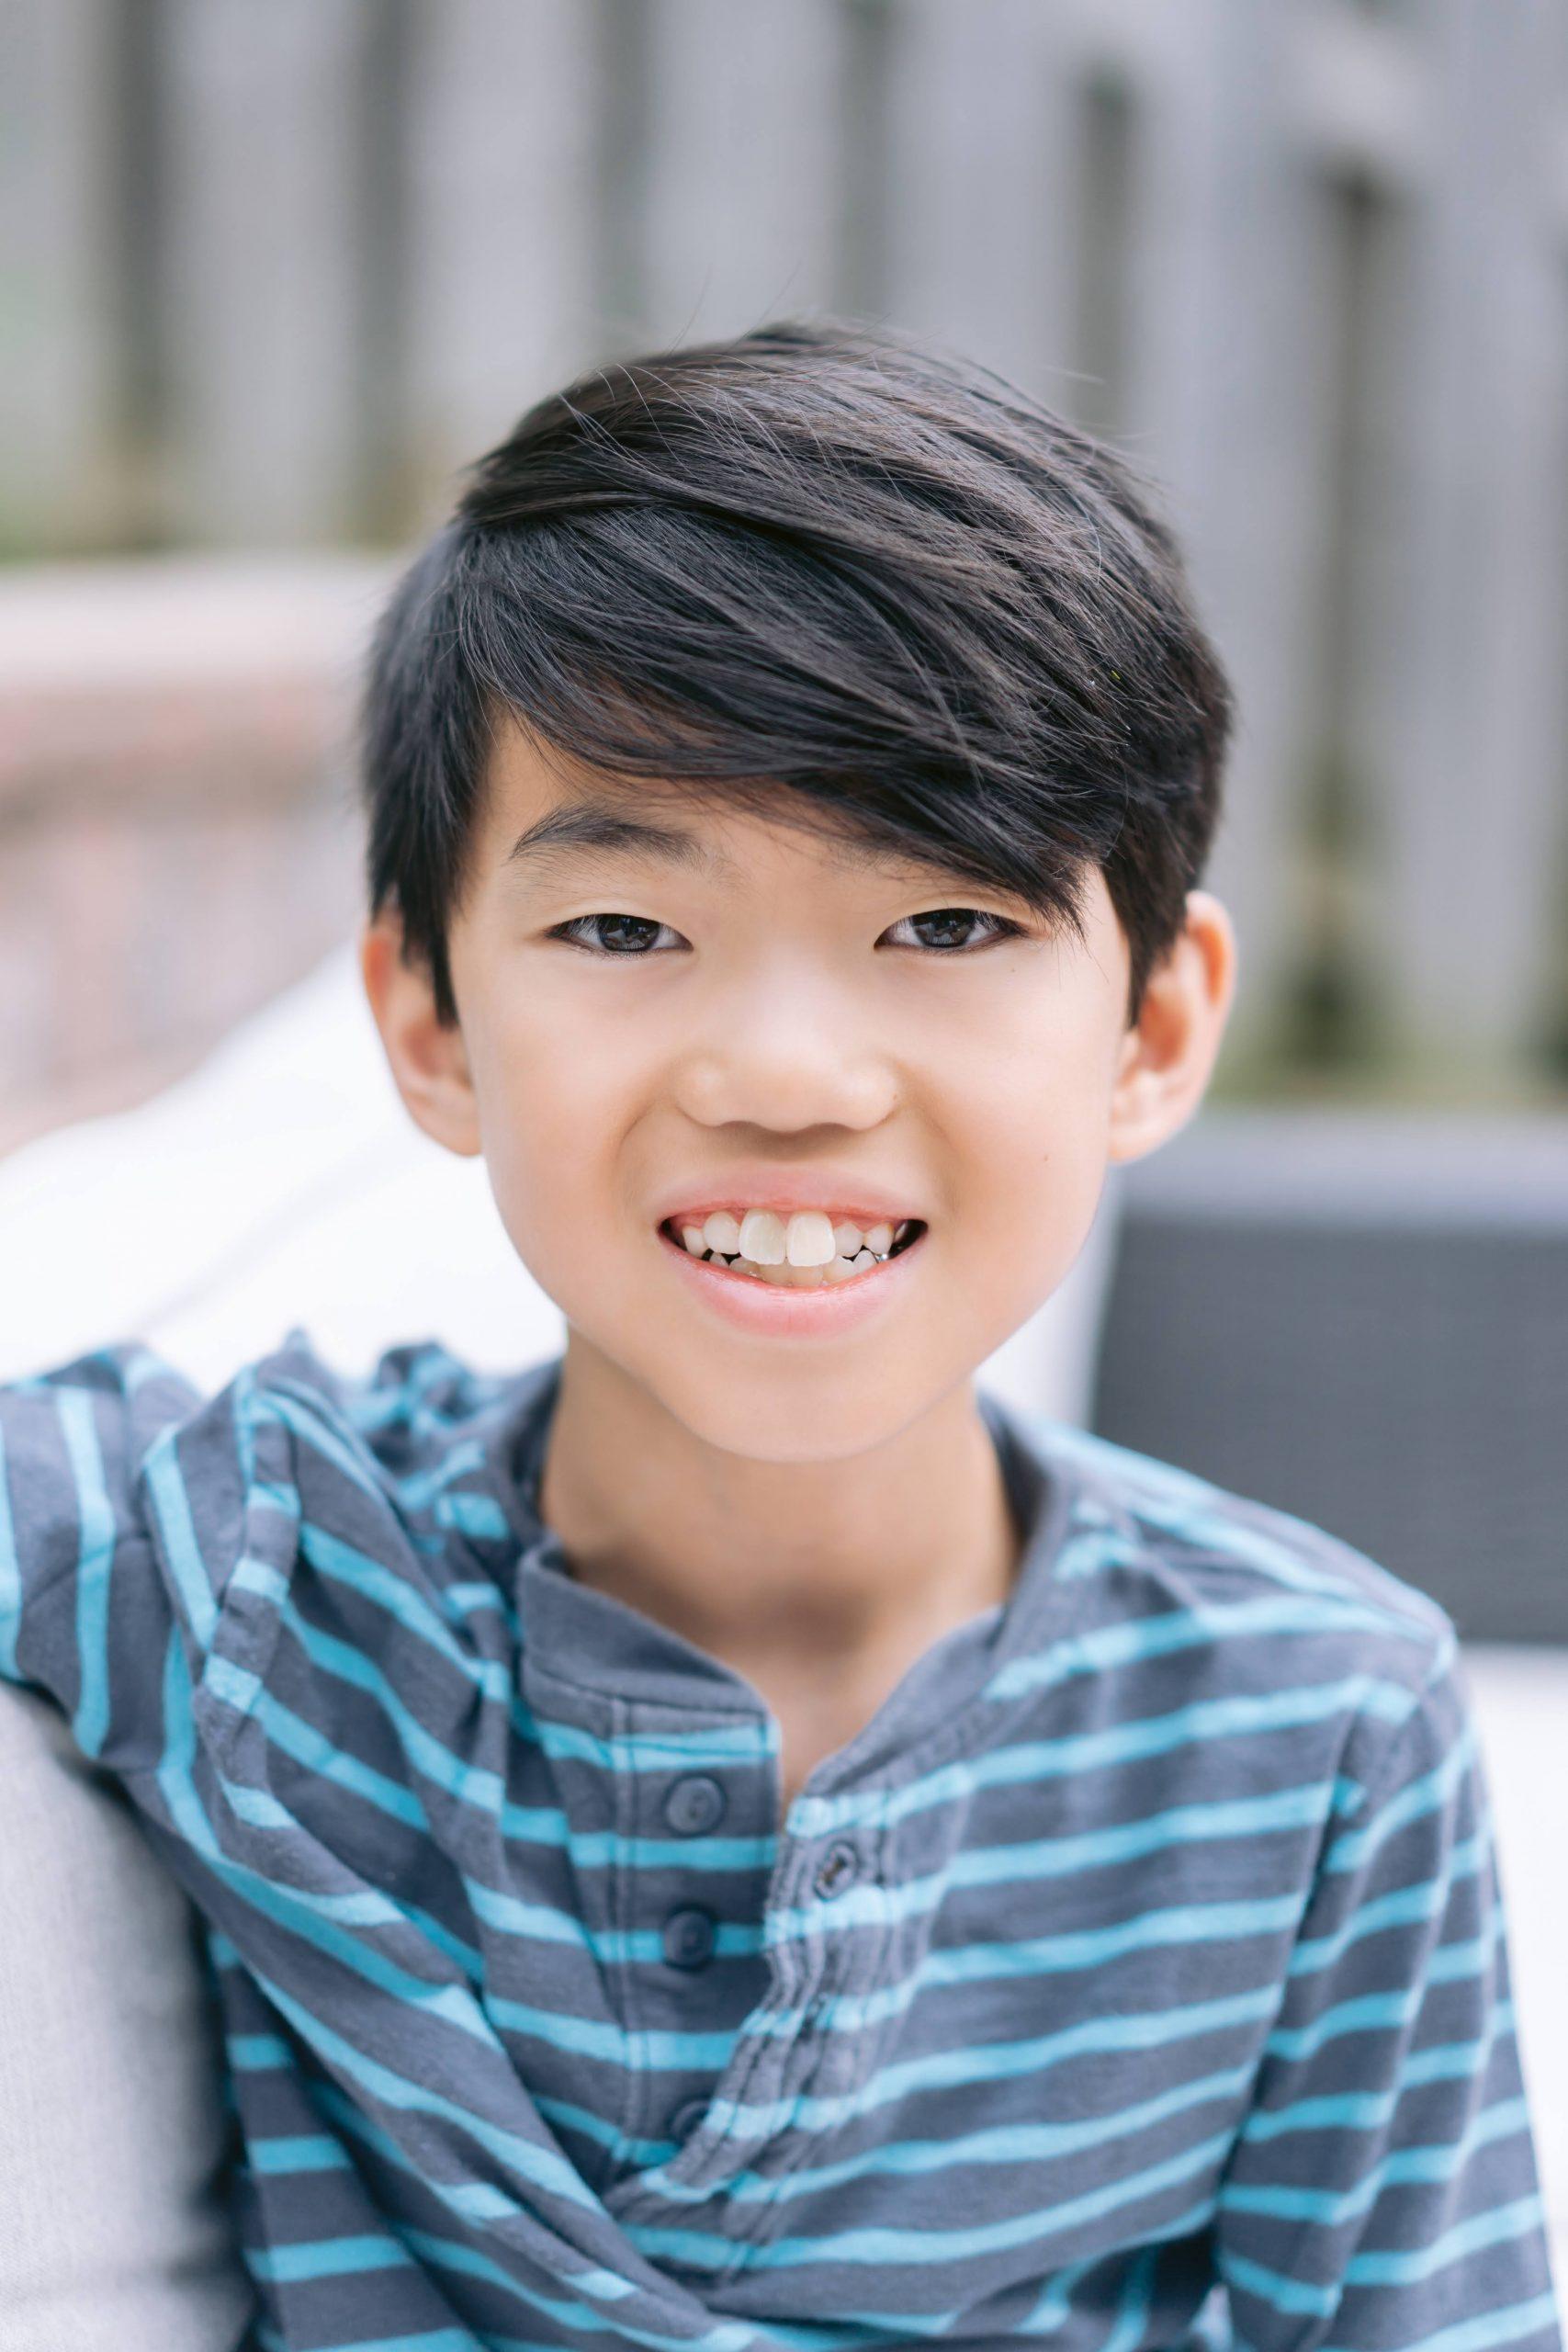 A photo Joee Wong's third son.